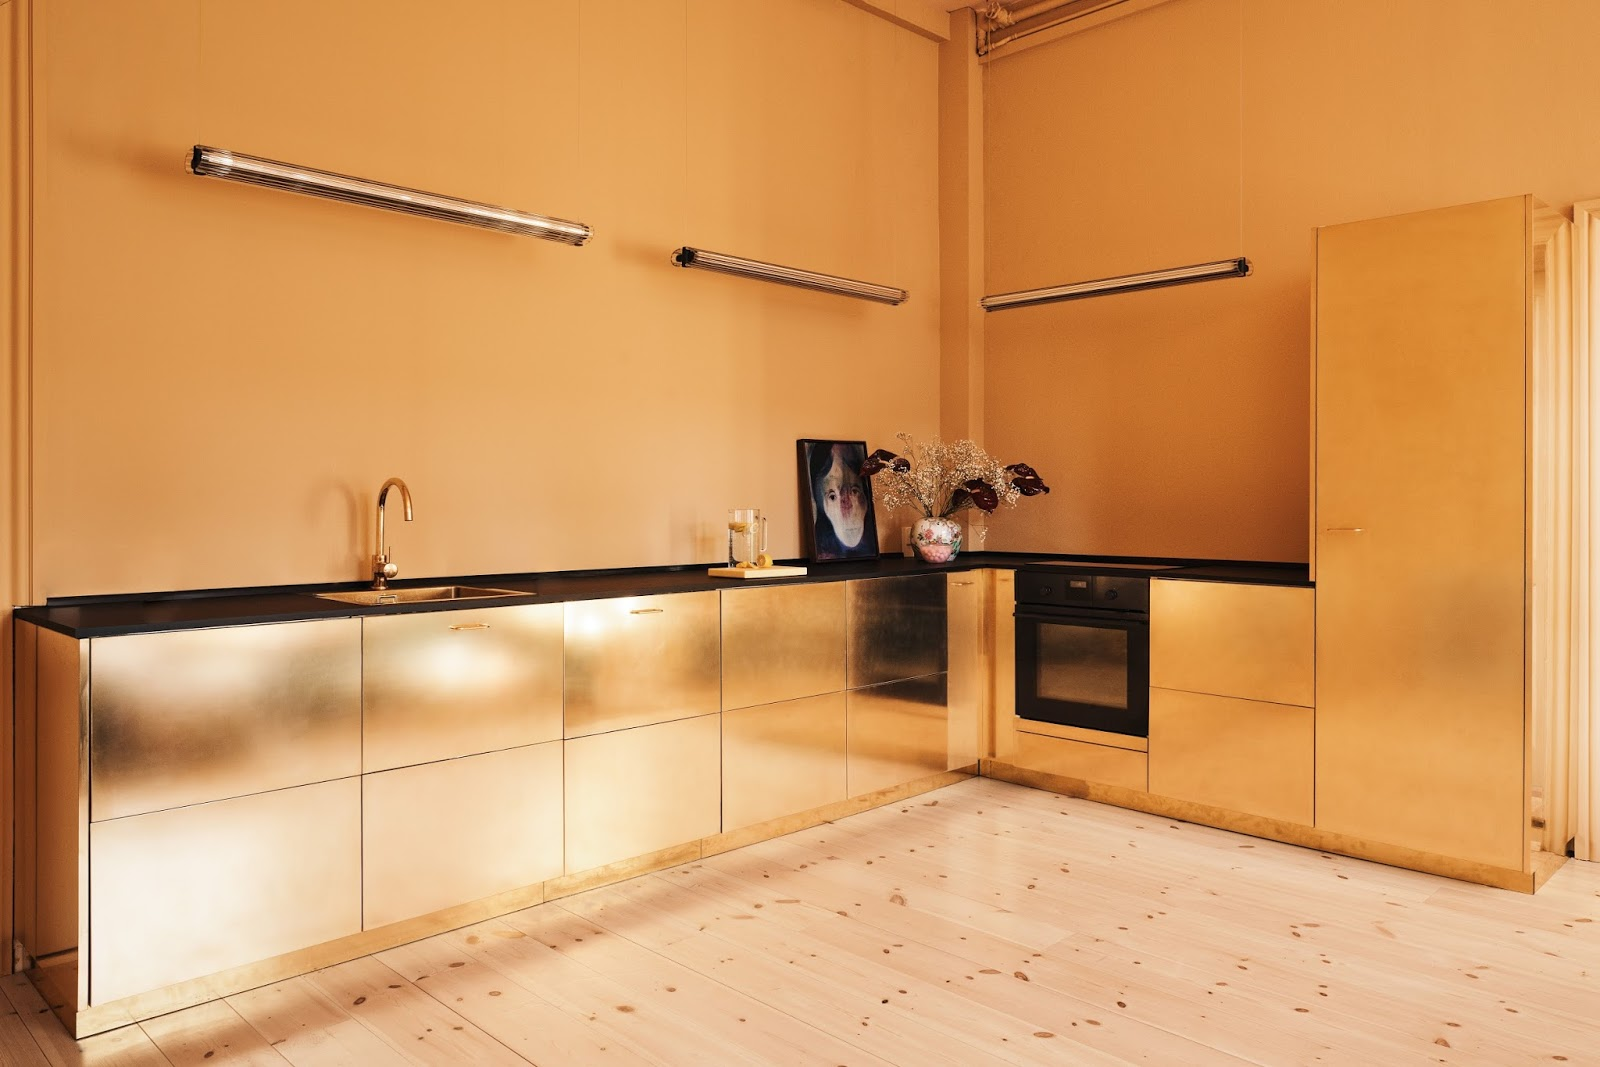 AMM blog The incredible gold kitchen of fashion designer